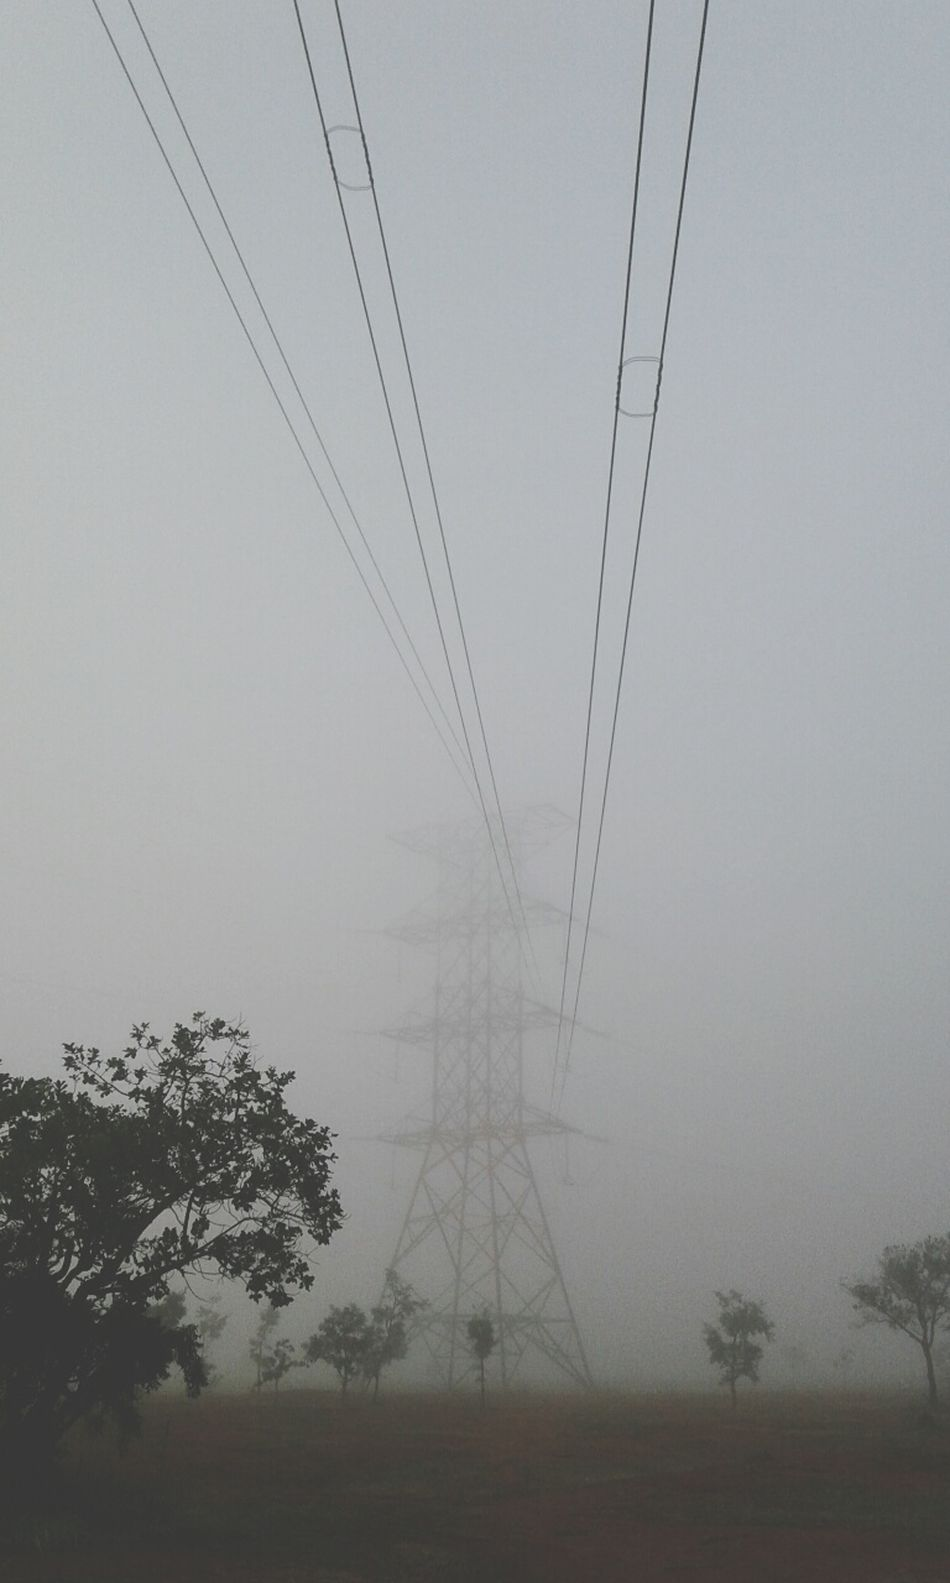 Environment Mist Myst Powerstation Electricity Tower Névoa Neblina Torre De Energia